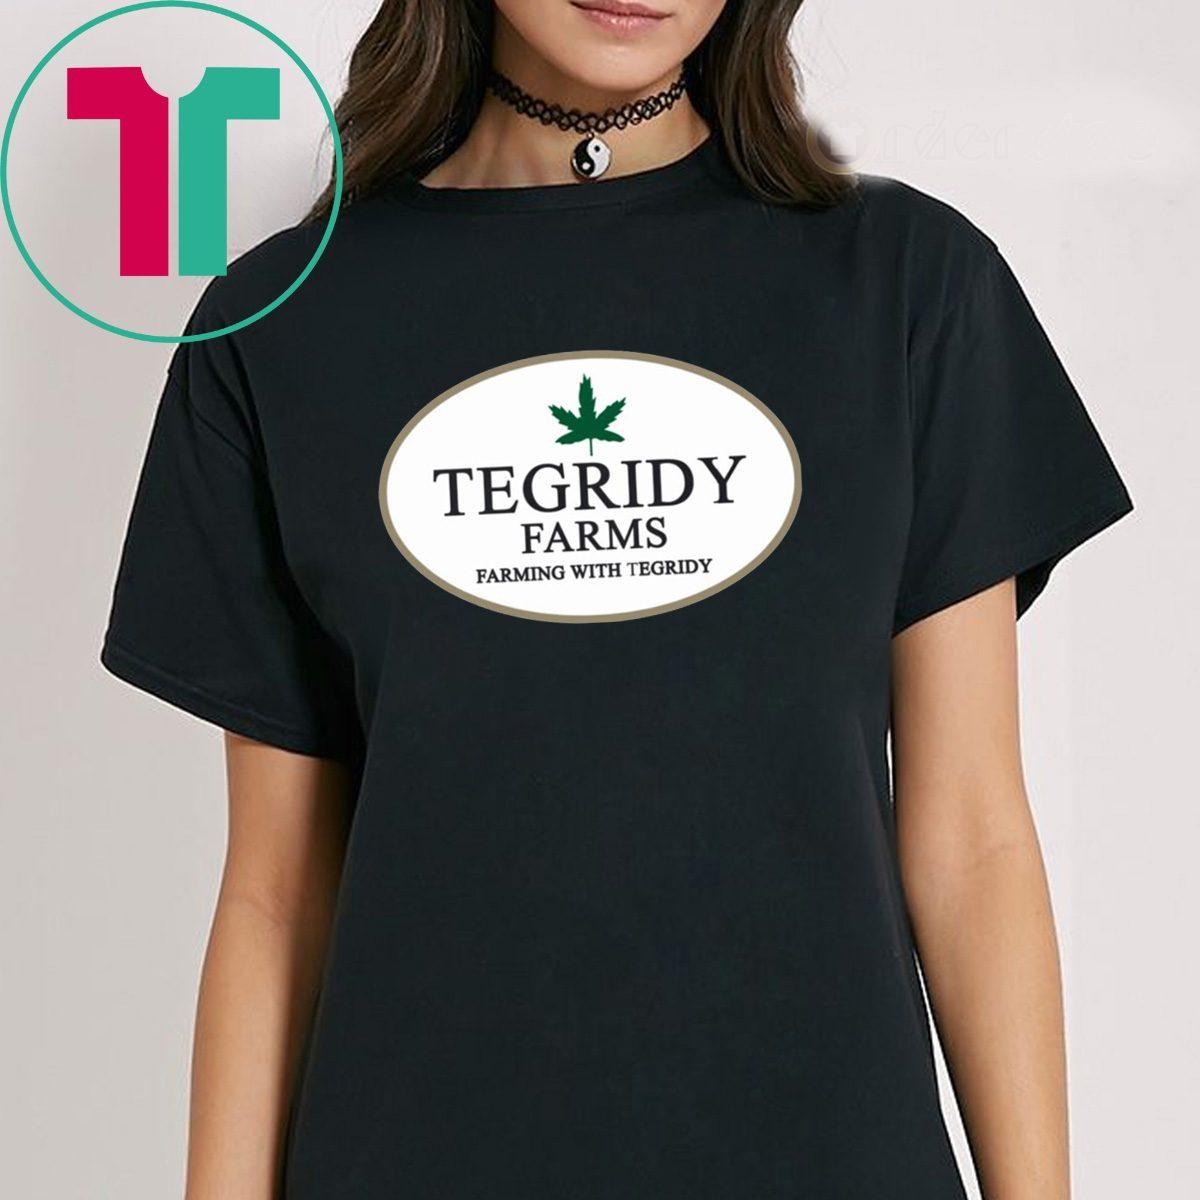 Tegridy